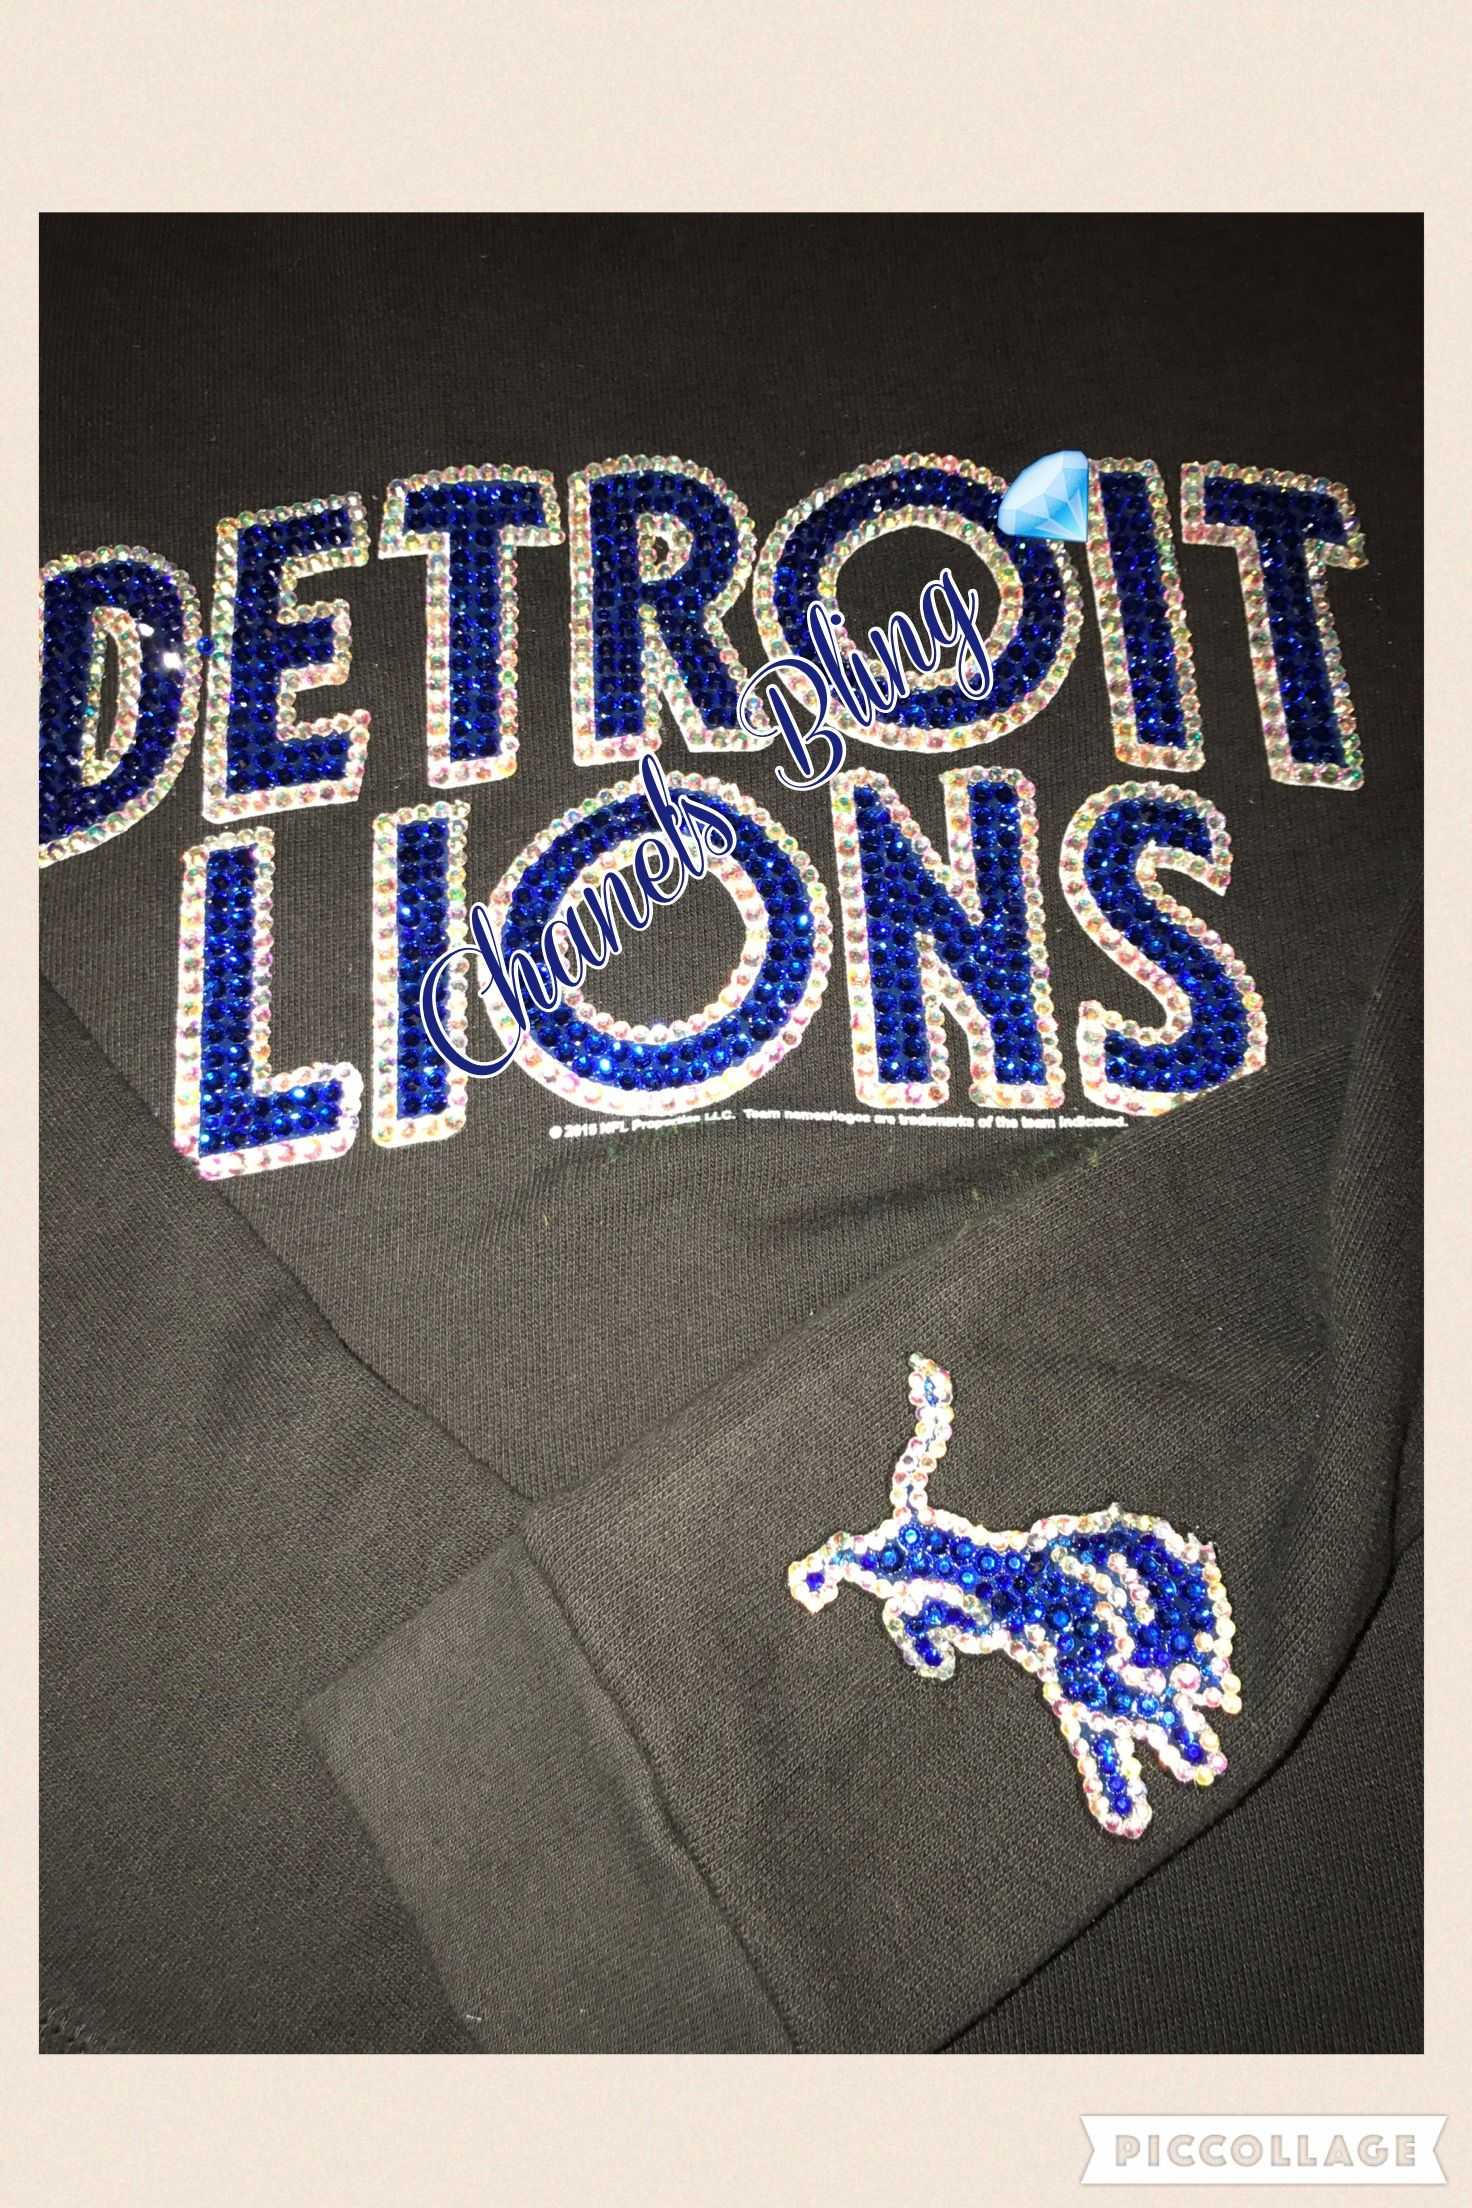 lowest price 54165 de3b0 Custom Bling Detroit Lions Inspired Sweatshirt   Bedazzled ...